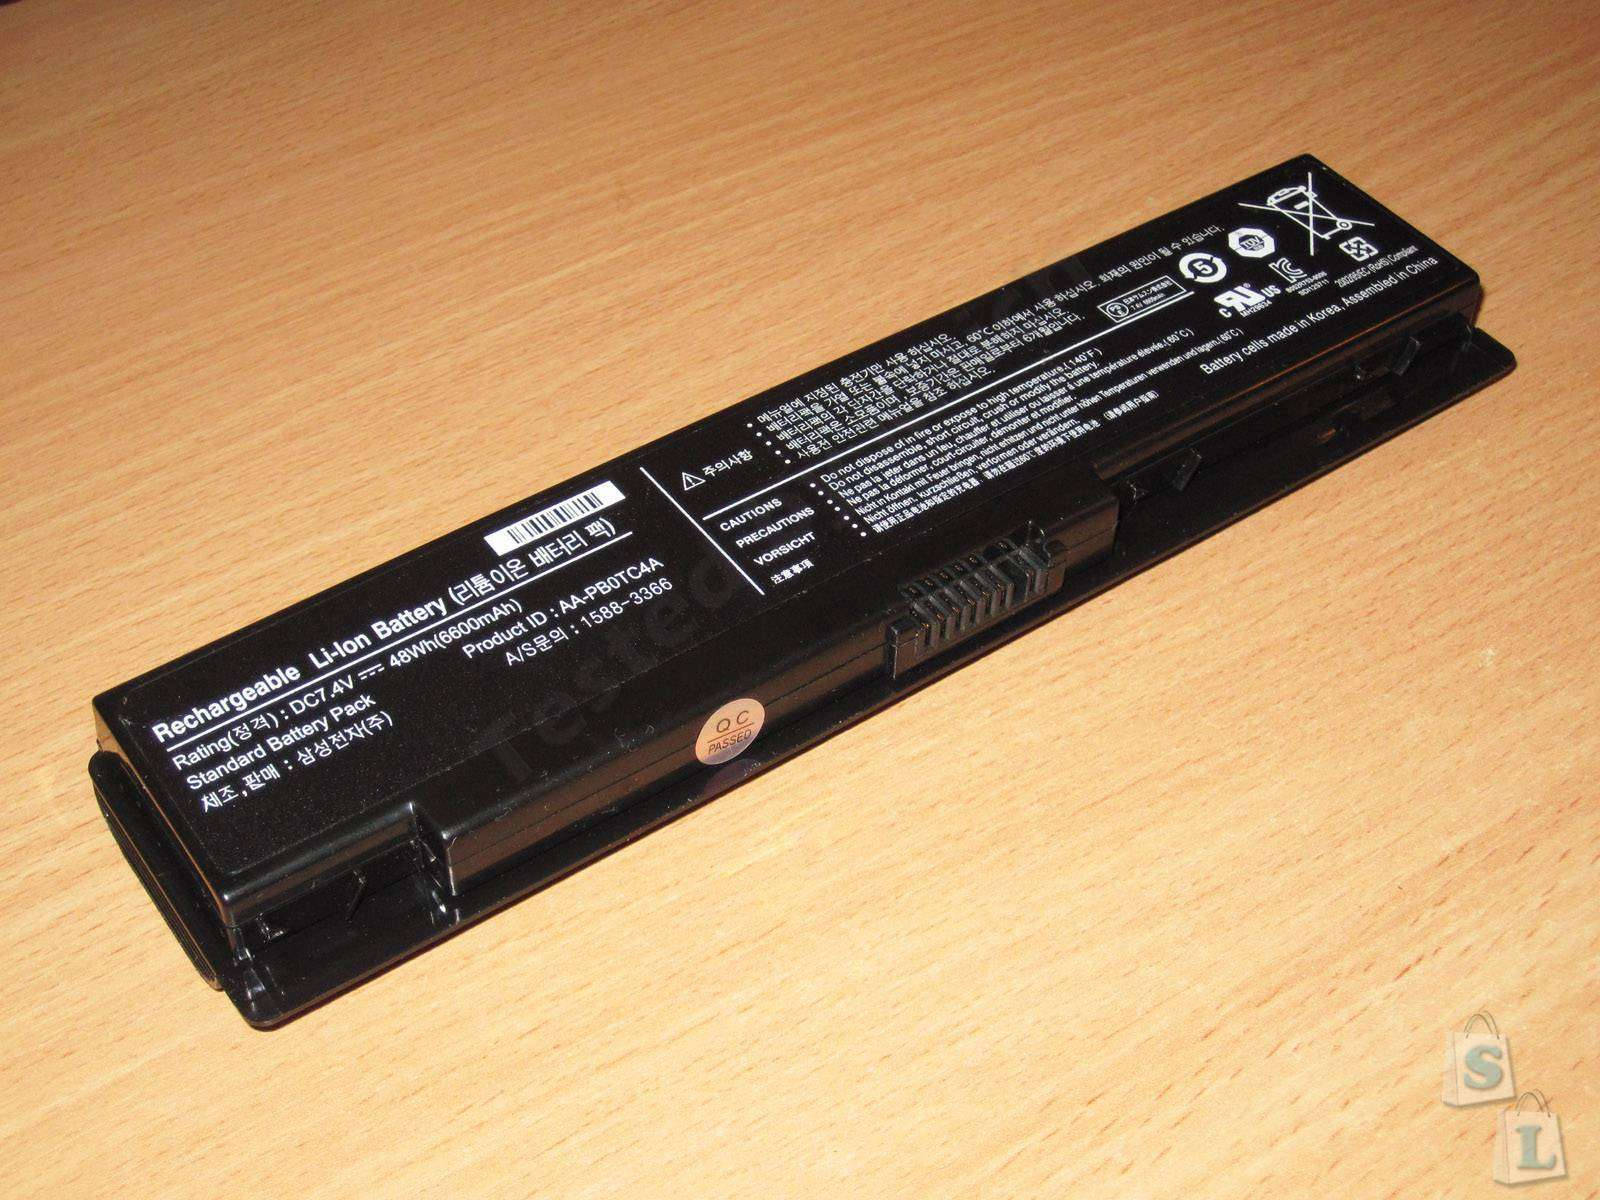 Aliexpress: Микрообзор аккумулятора для нетбука, ну очень коротко